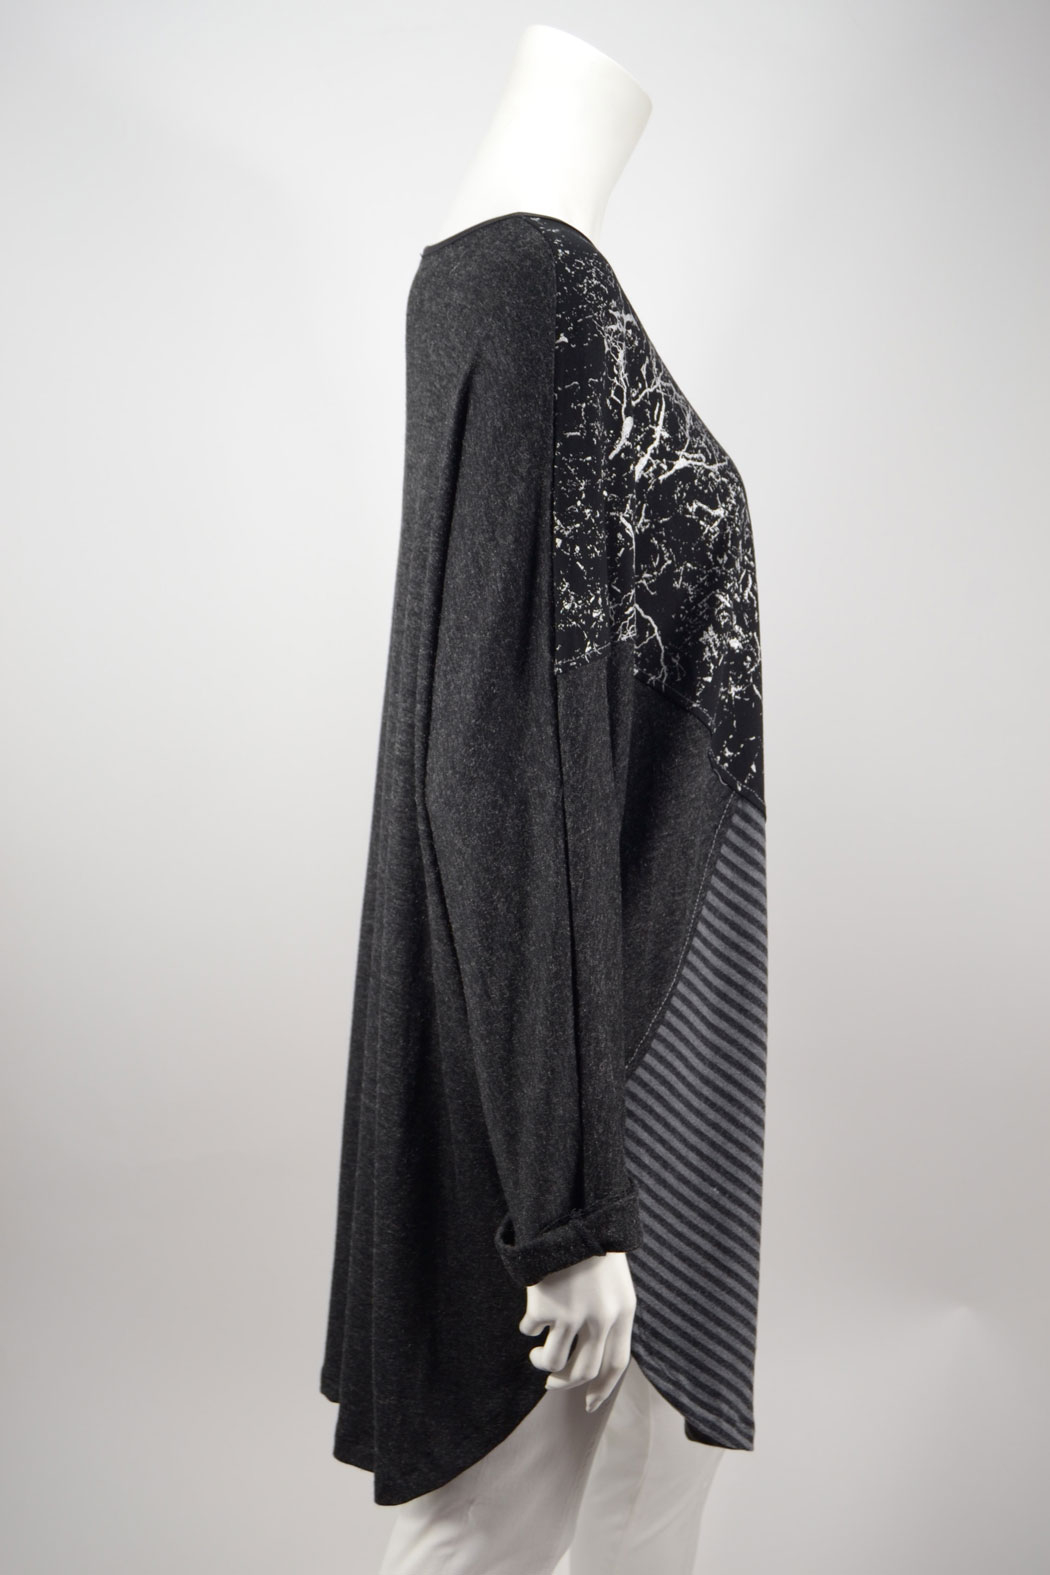 024f2b3b34e3 AKH Damen Tunika Longshirt im Muster-Mix aus Viskose Schwarz 44 46, 79,90 €